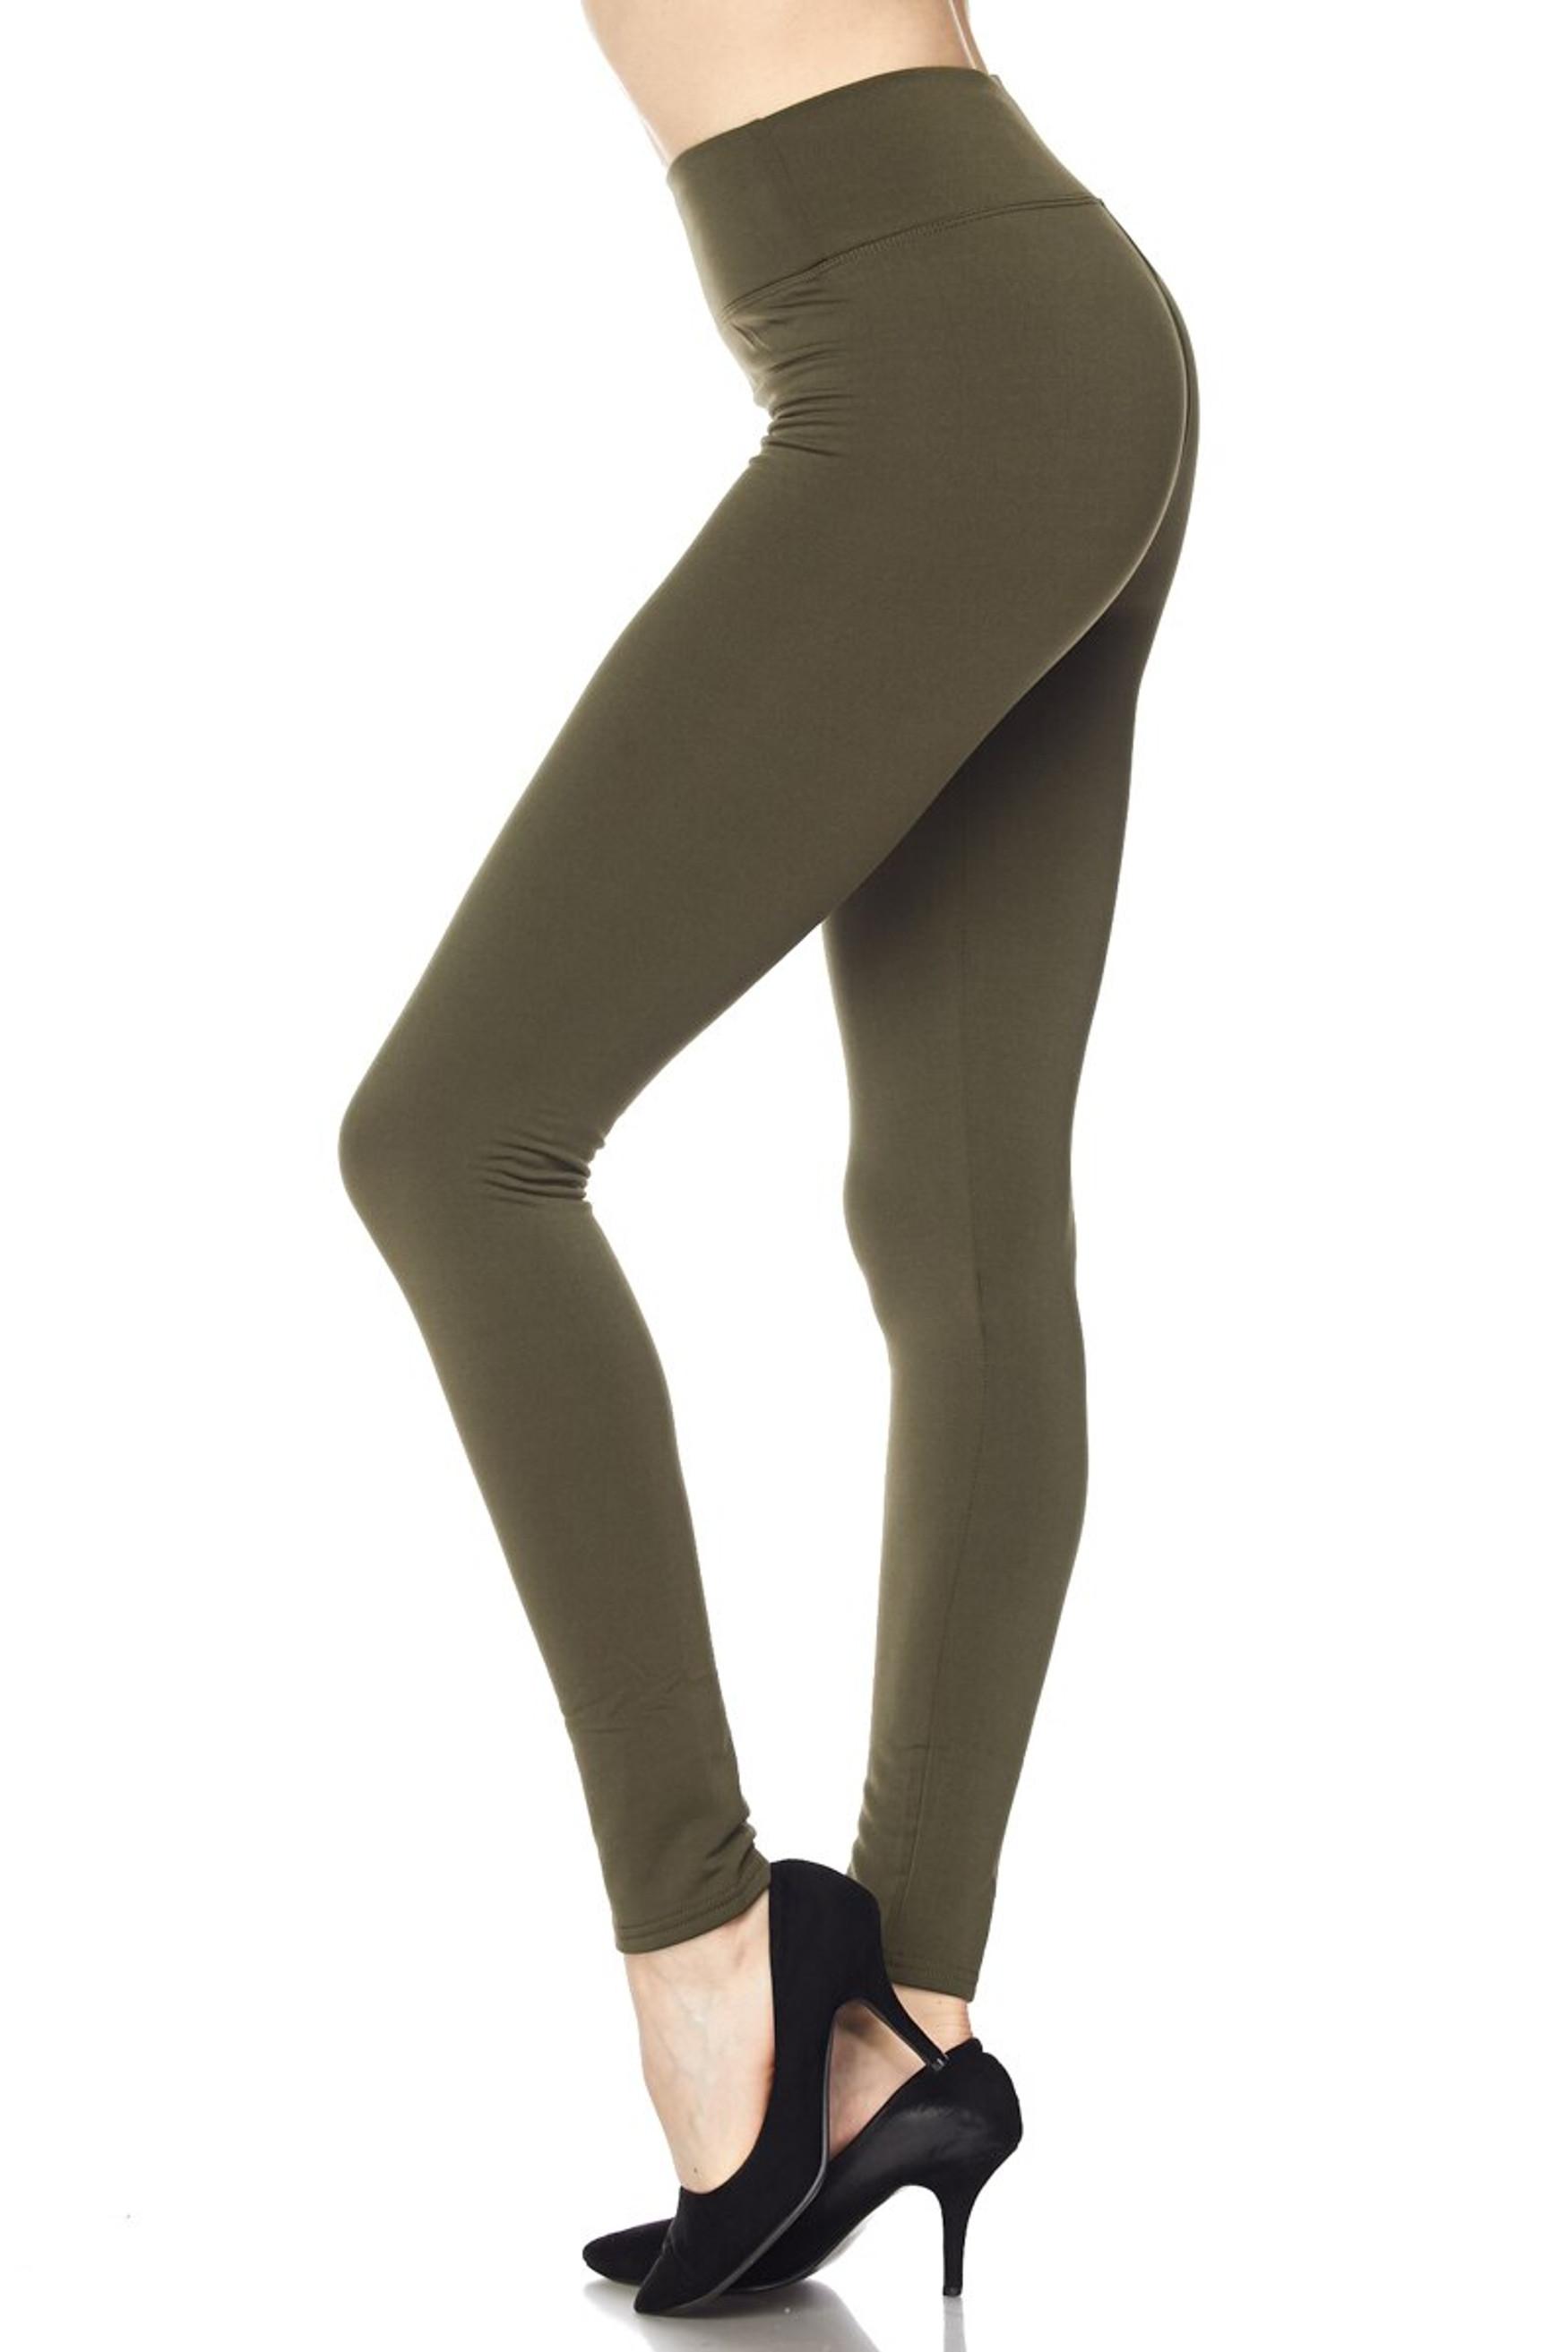 High Waisted Fleece Lined Plus Size Leggings - 5 Inch Waistband